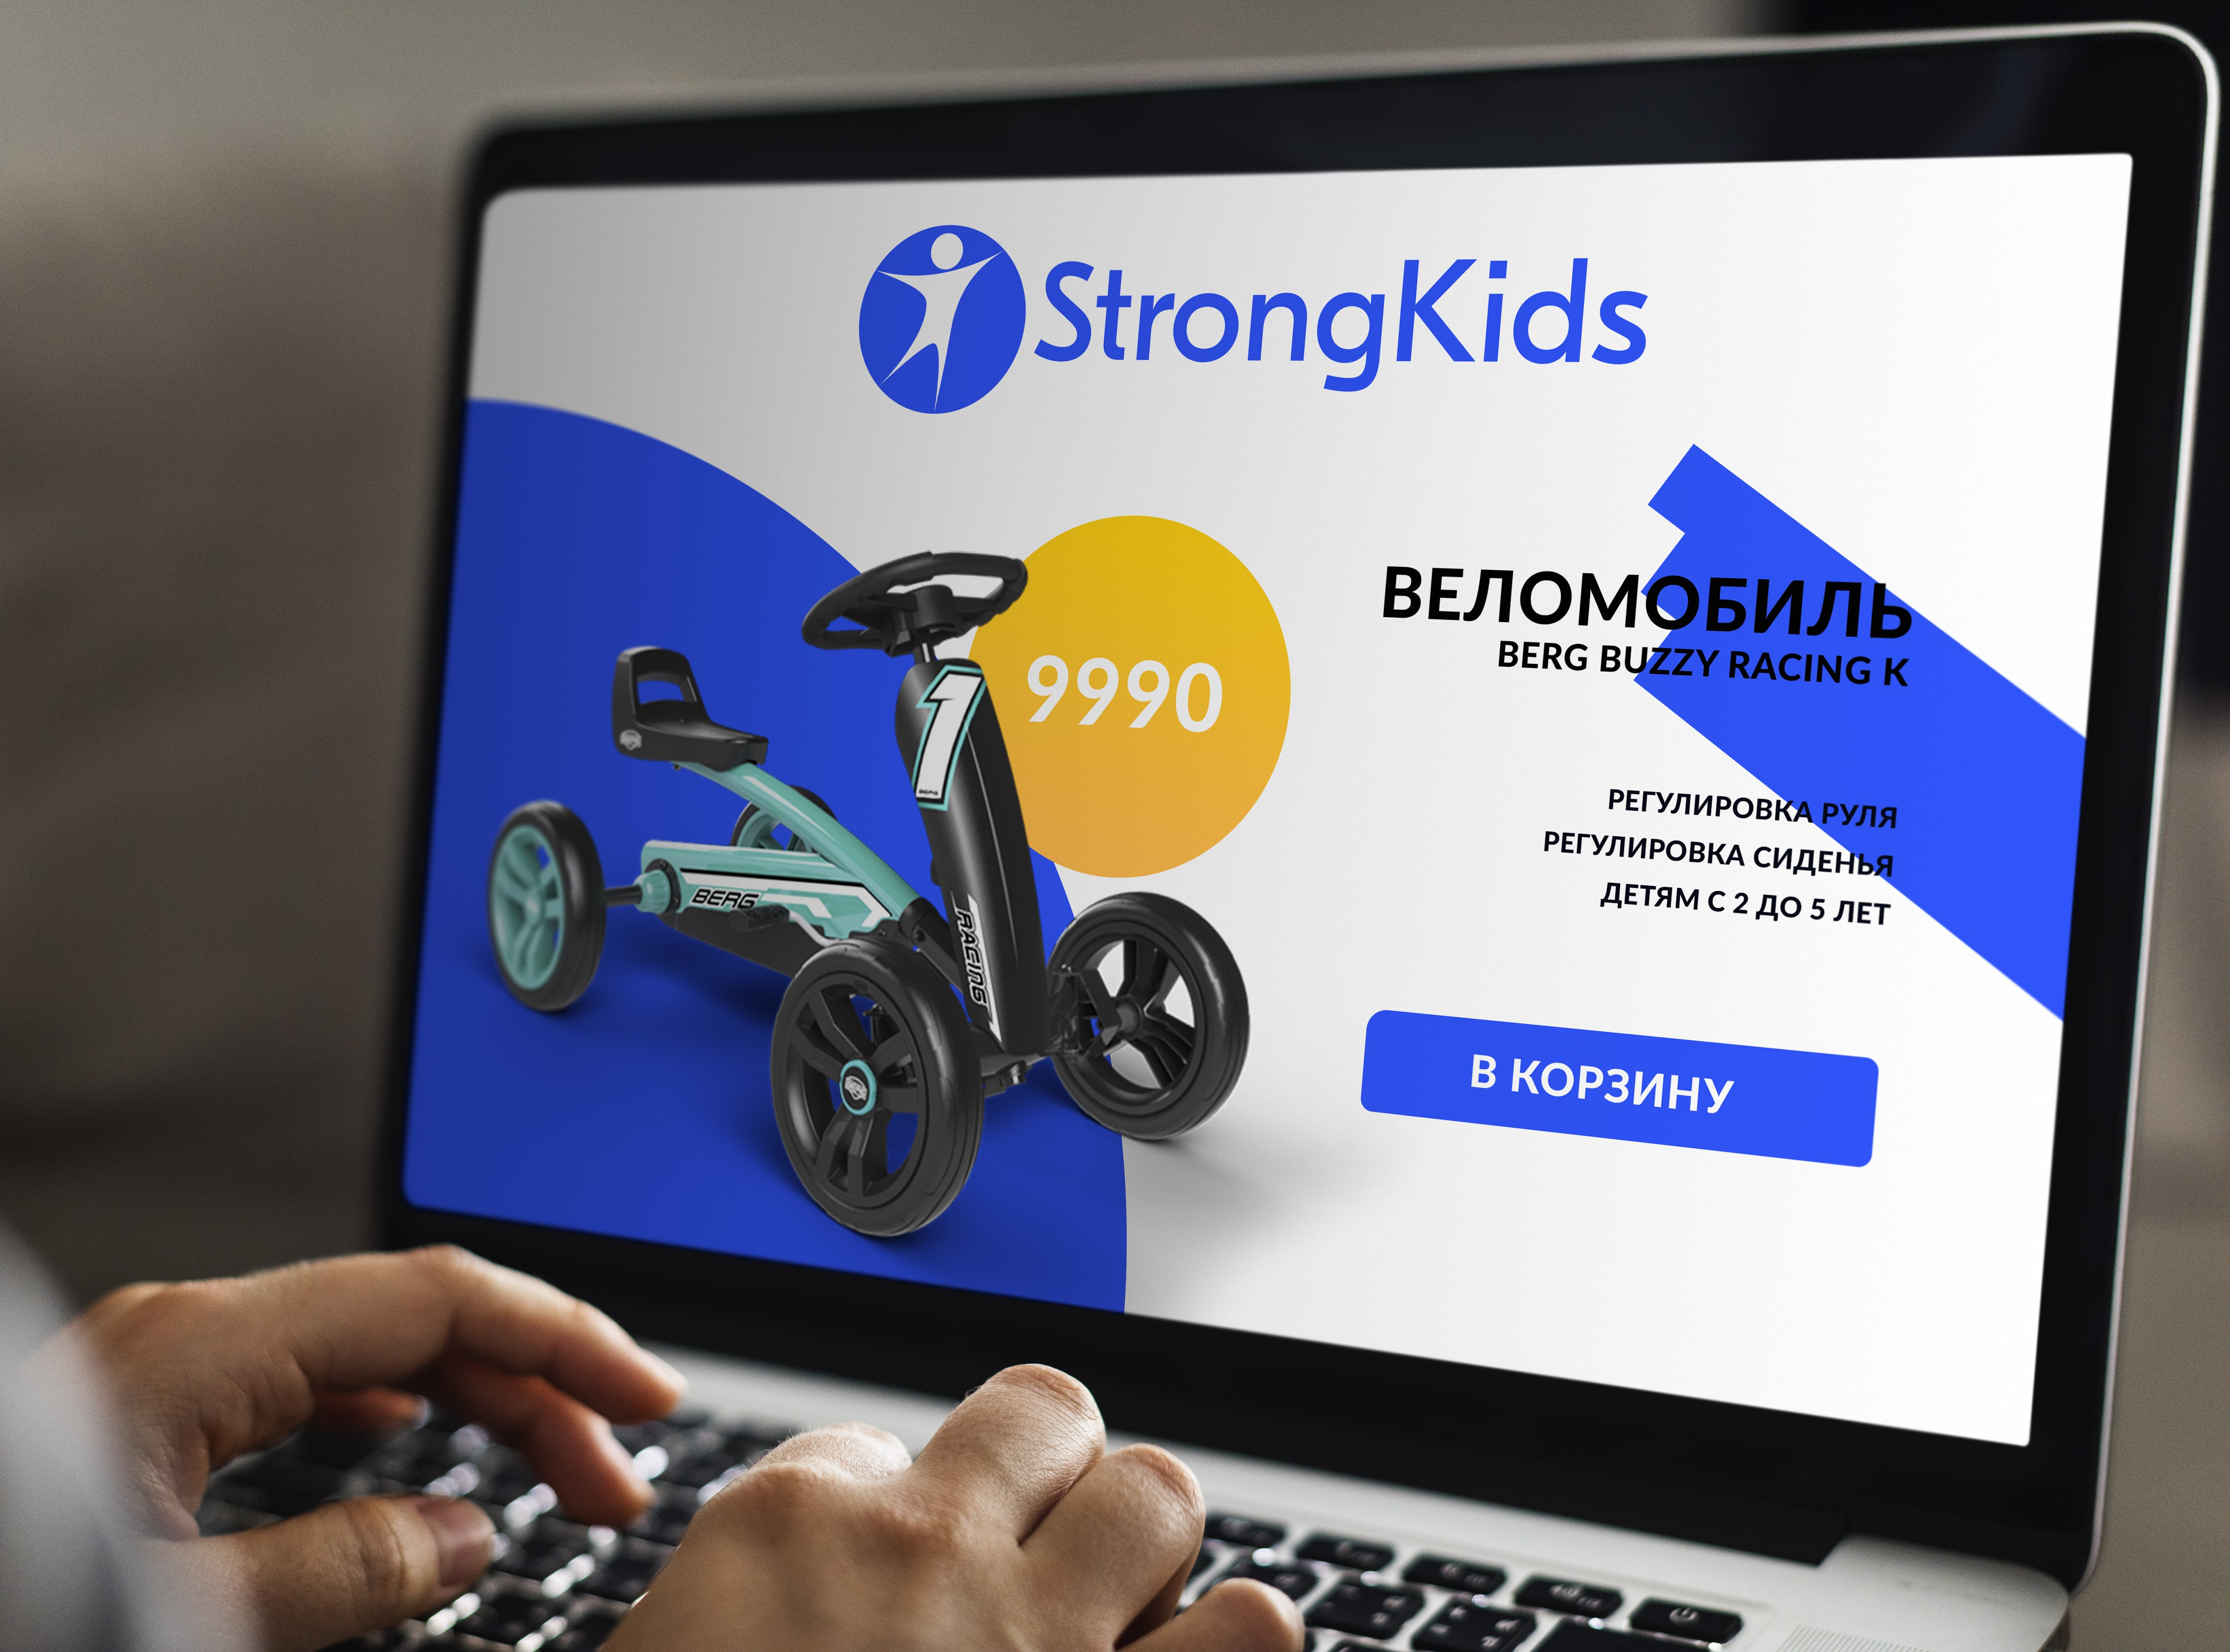 Логотип для Детского Интернет Магазина StrongKids фото f_1725c6336aa3f142.jpg